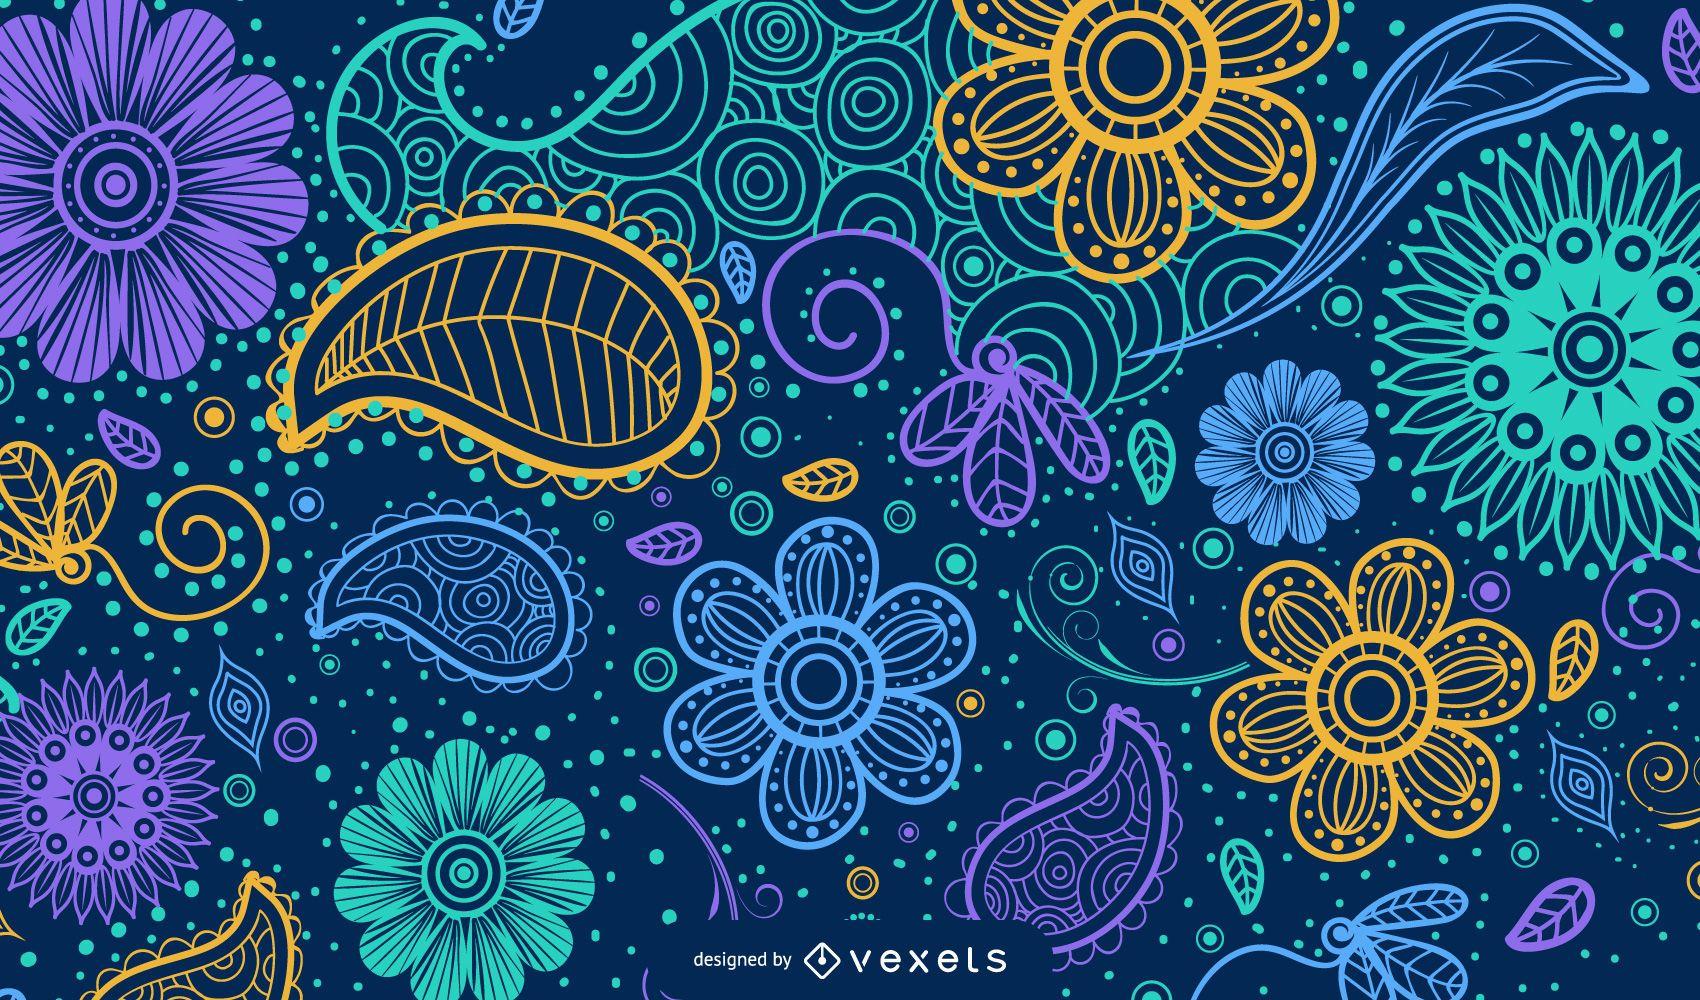 Paisley Background Design